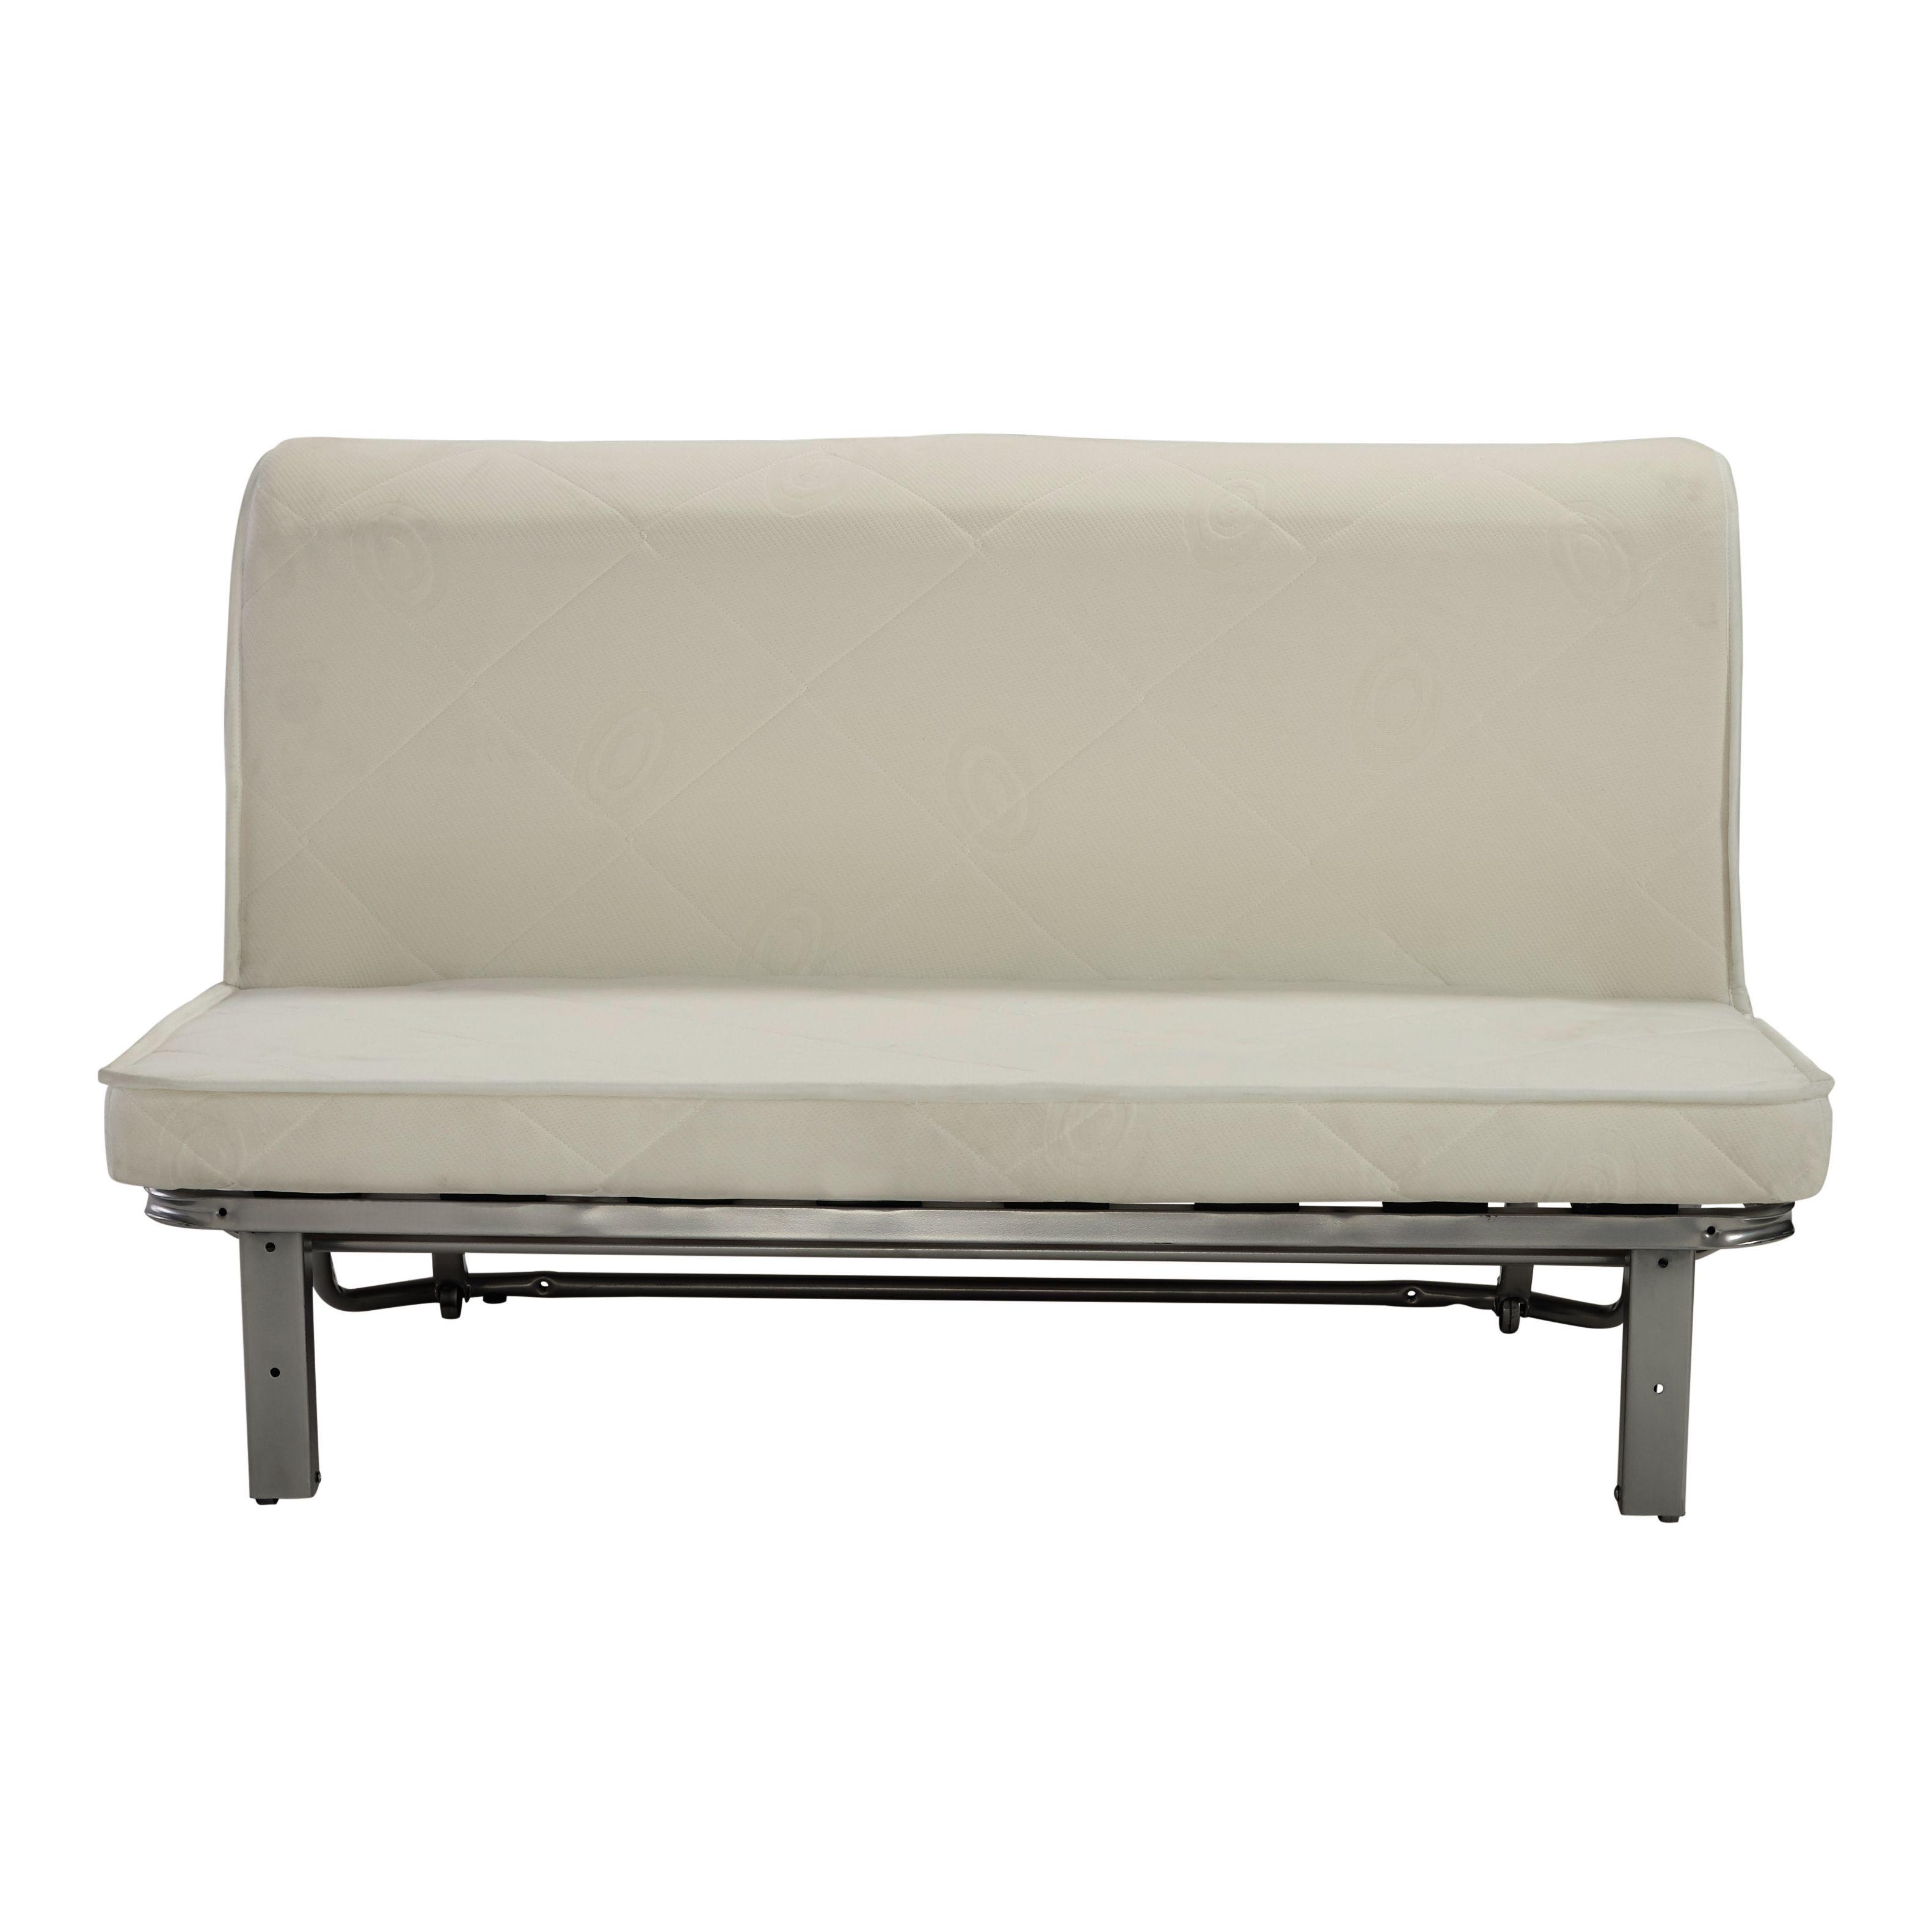 Canap Bz 2 Places Dunlopillo Folding Bed 140x92 230canap Elliot